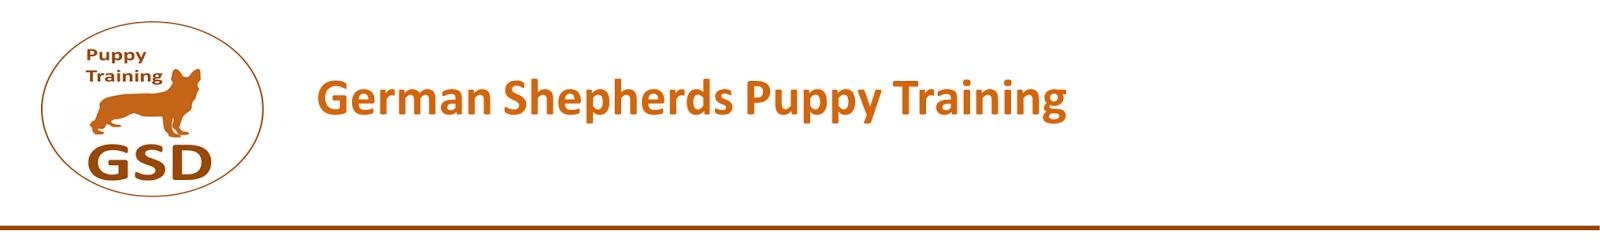 german shepherds  puppy training